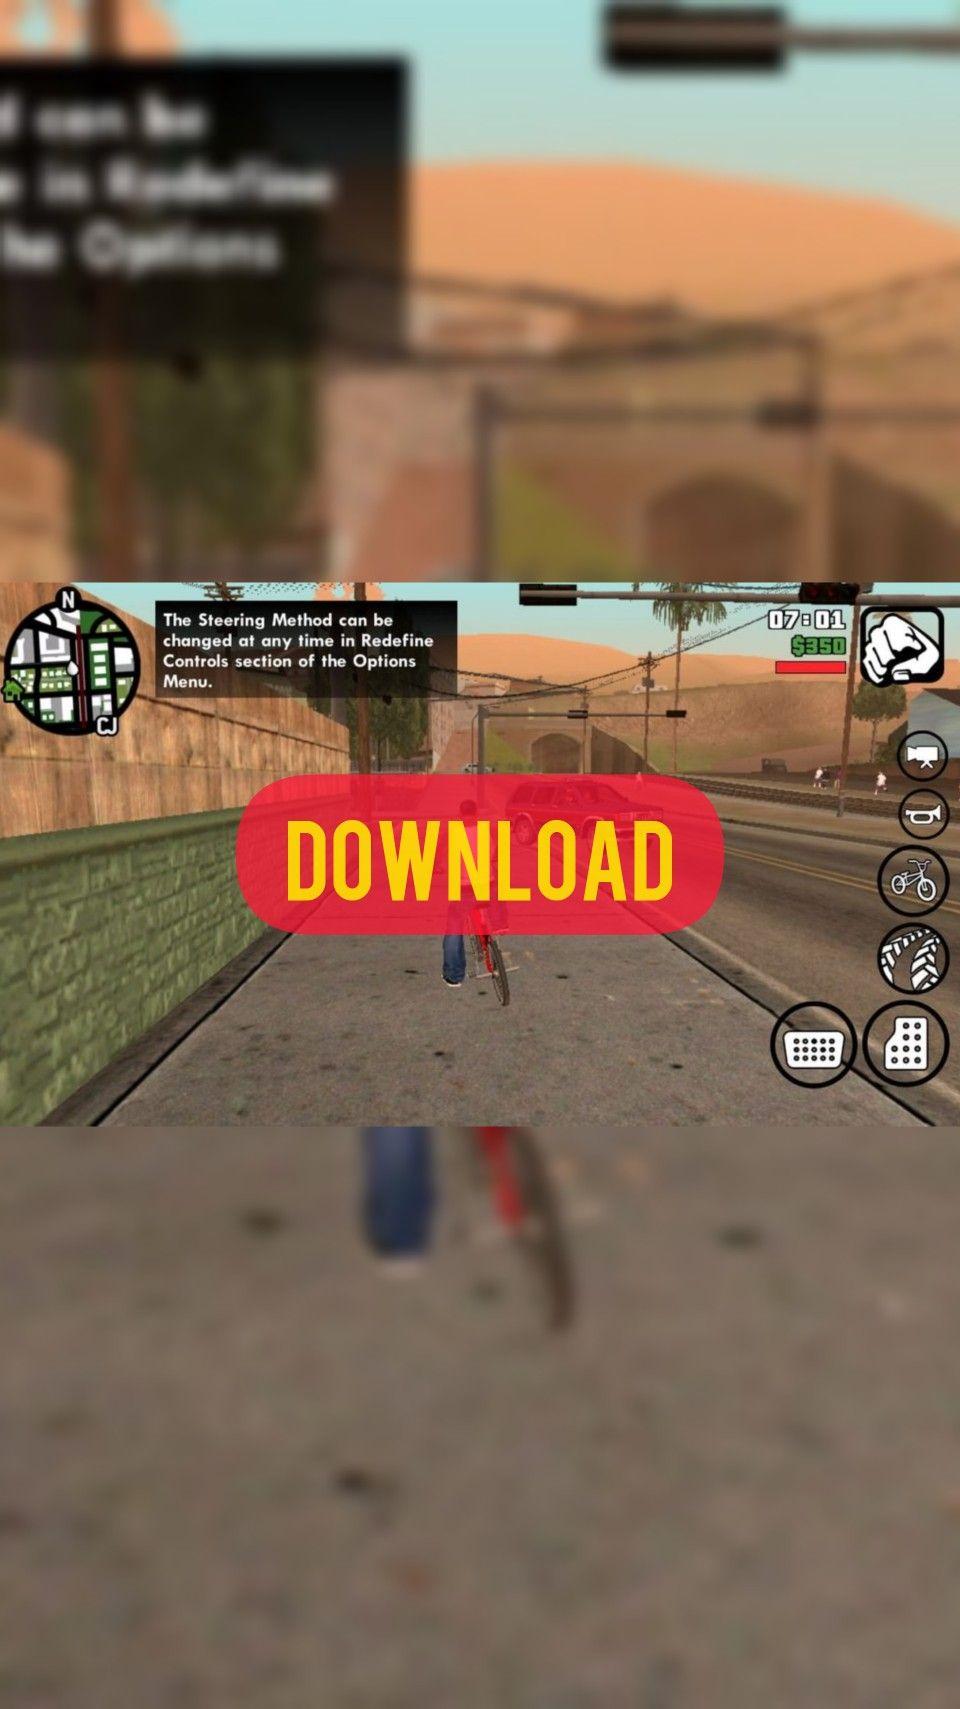 تحميل Gta San Andreas آخر نسخة مهكرة مجانا للاندرويد Download Gta San Andreas Mod For Android Best Games San Andreas Highway Signs